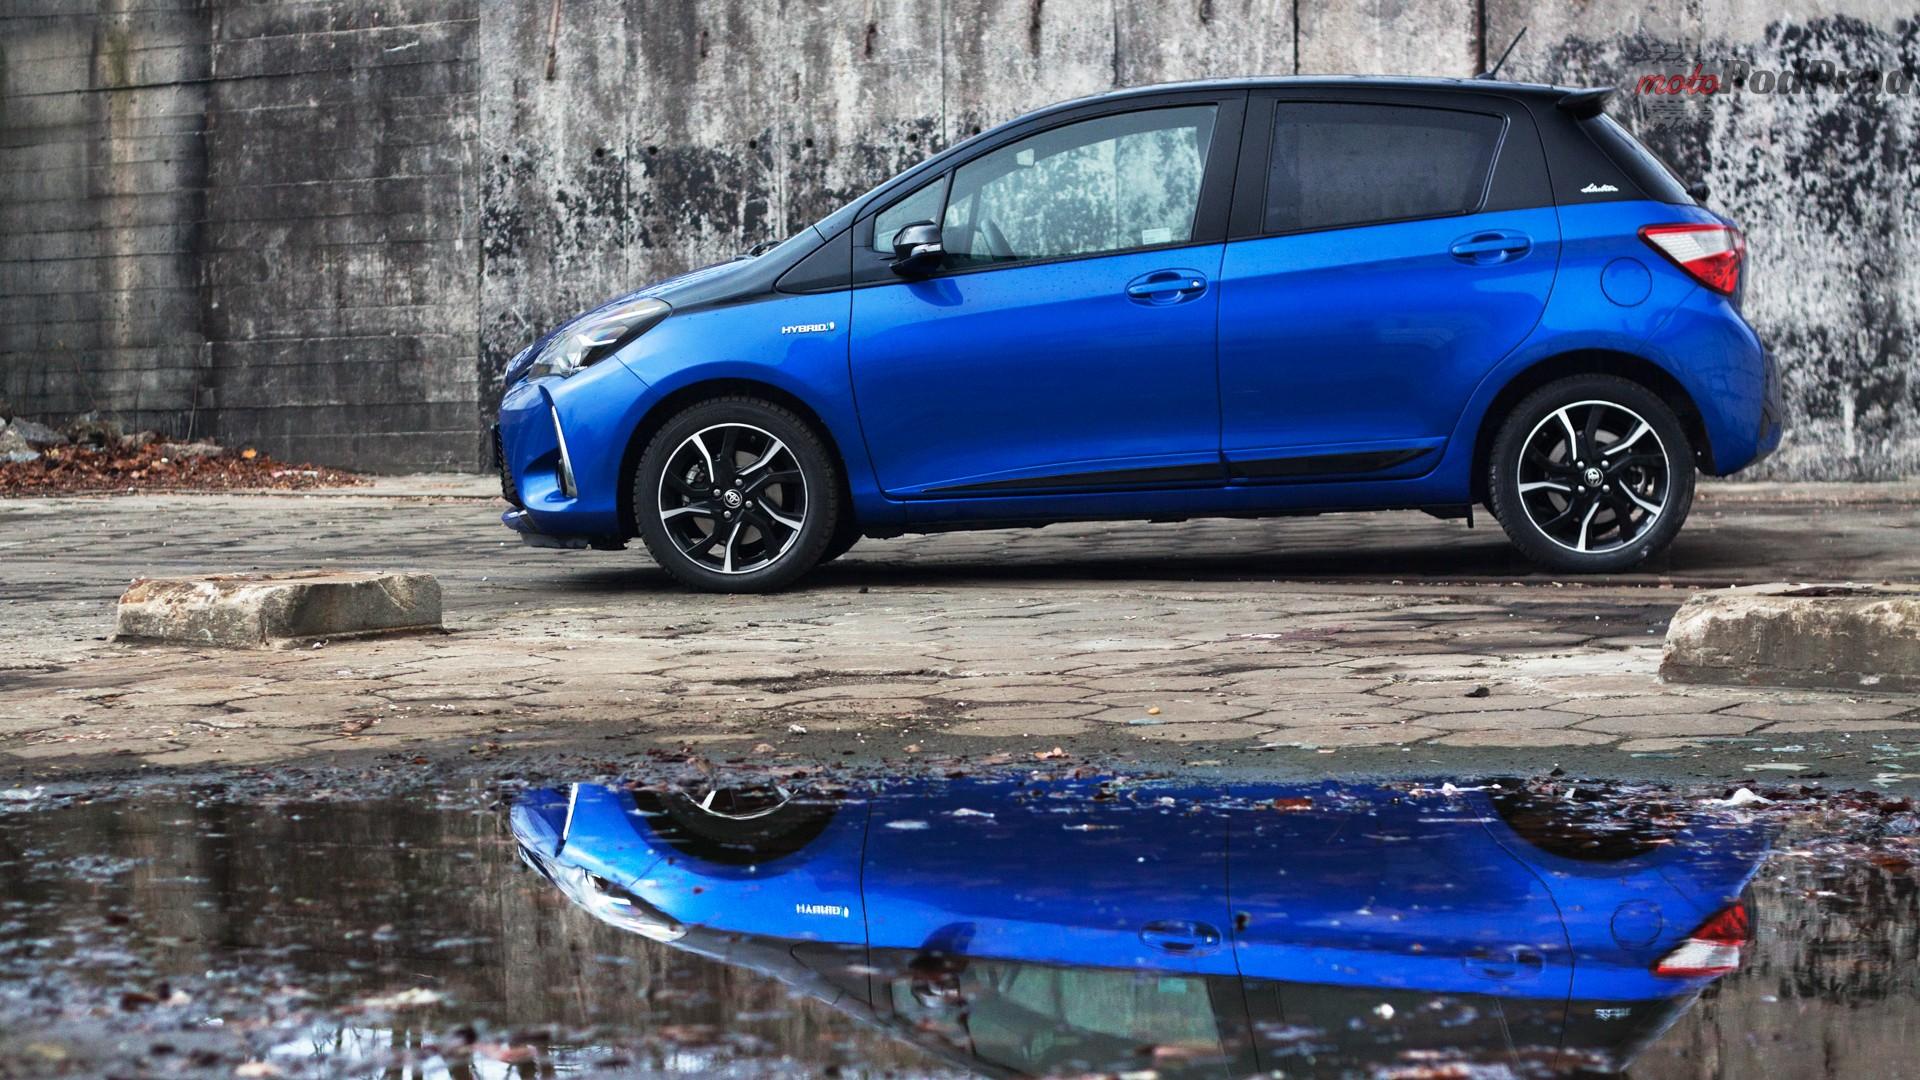 toyota yaris hybrydowa hybrid 2017 selection bok profil niebieski Test: Toyota Yaris Hybrid Selection   chłodna kalkulacja?